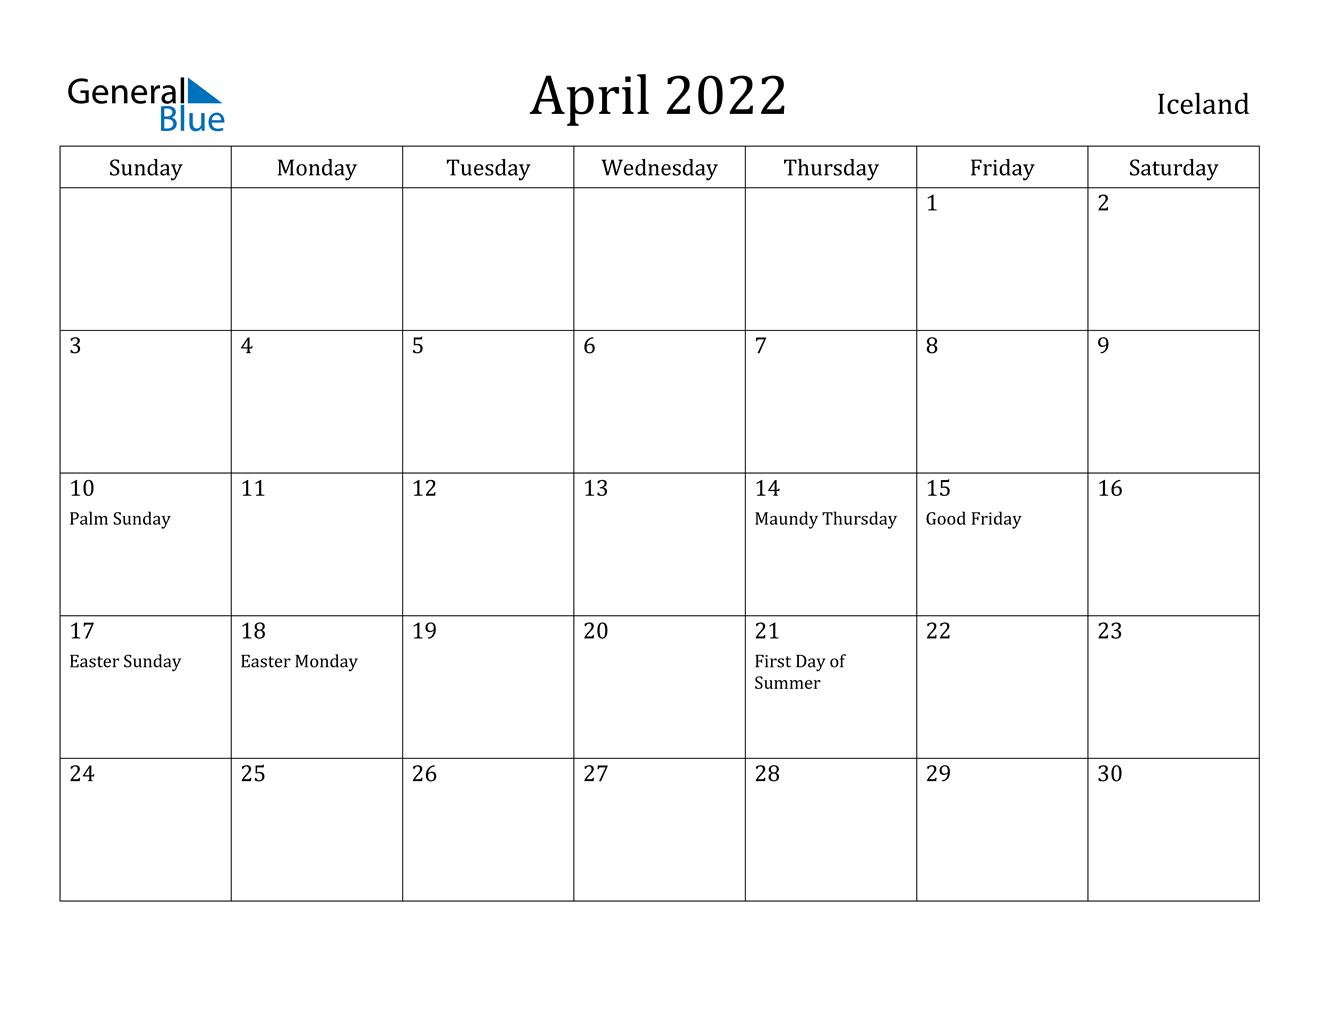 April 2022 Calendar - Iceland